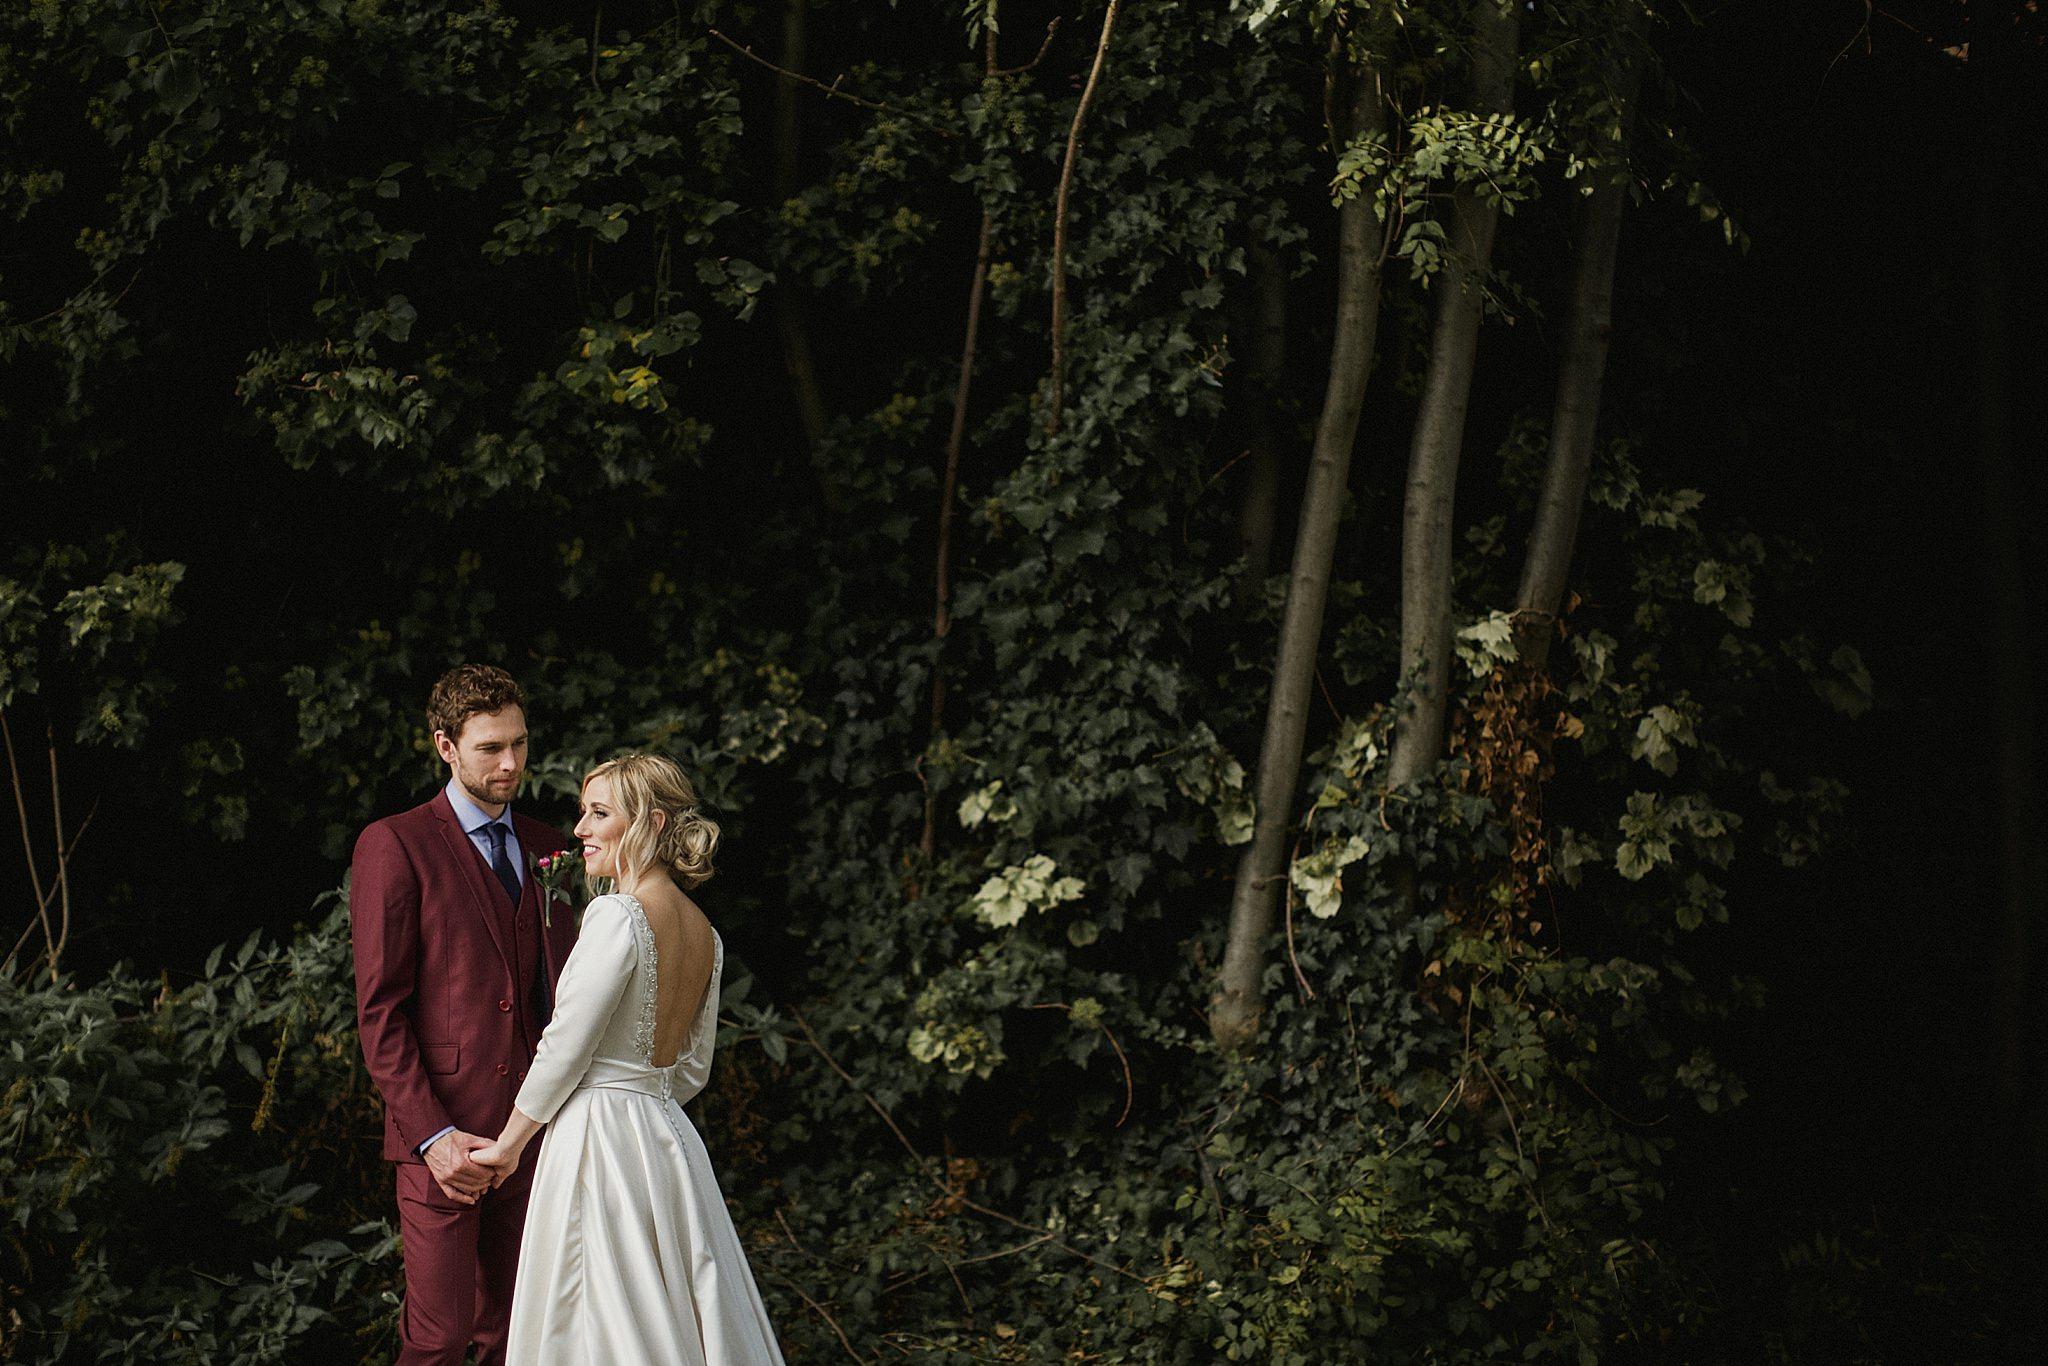 Wedding_Photography_Sheffield_0006.jpg